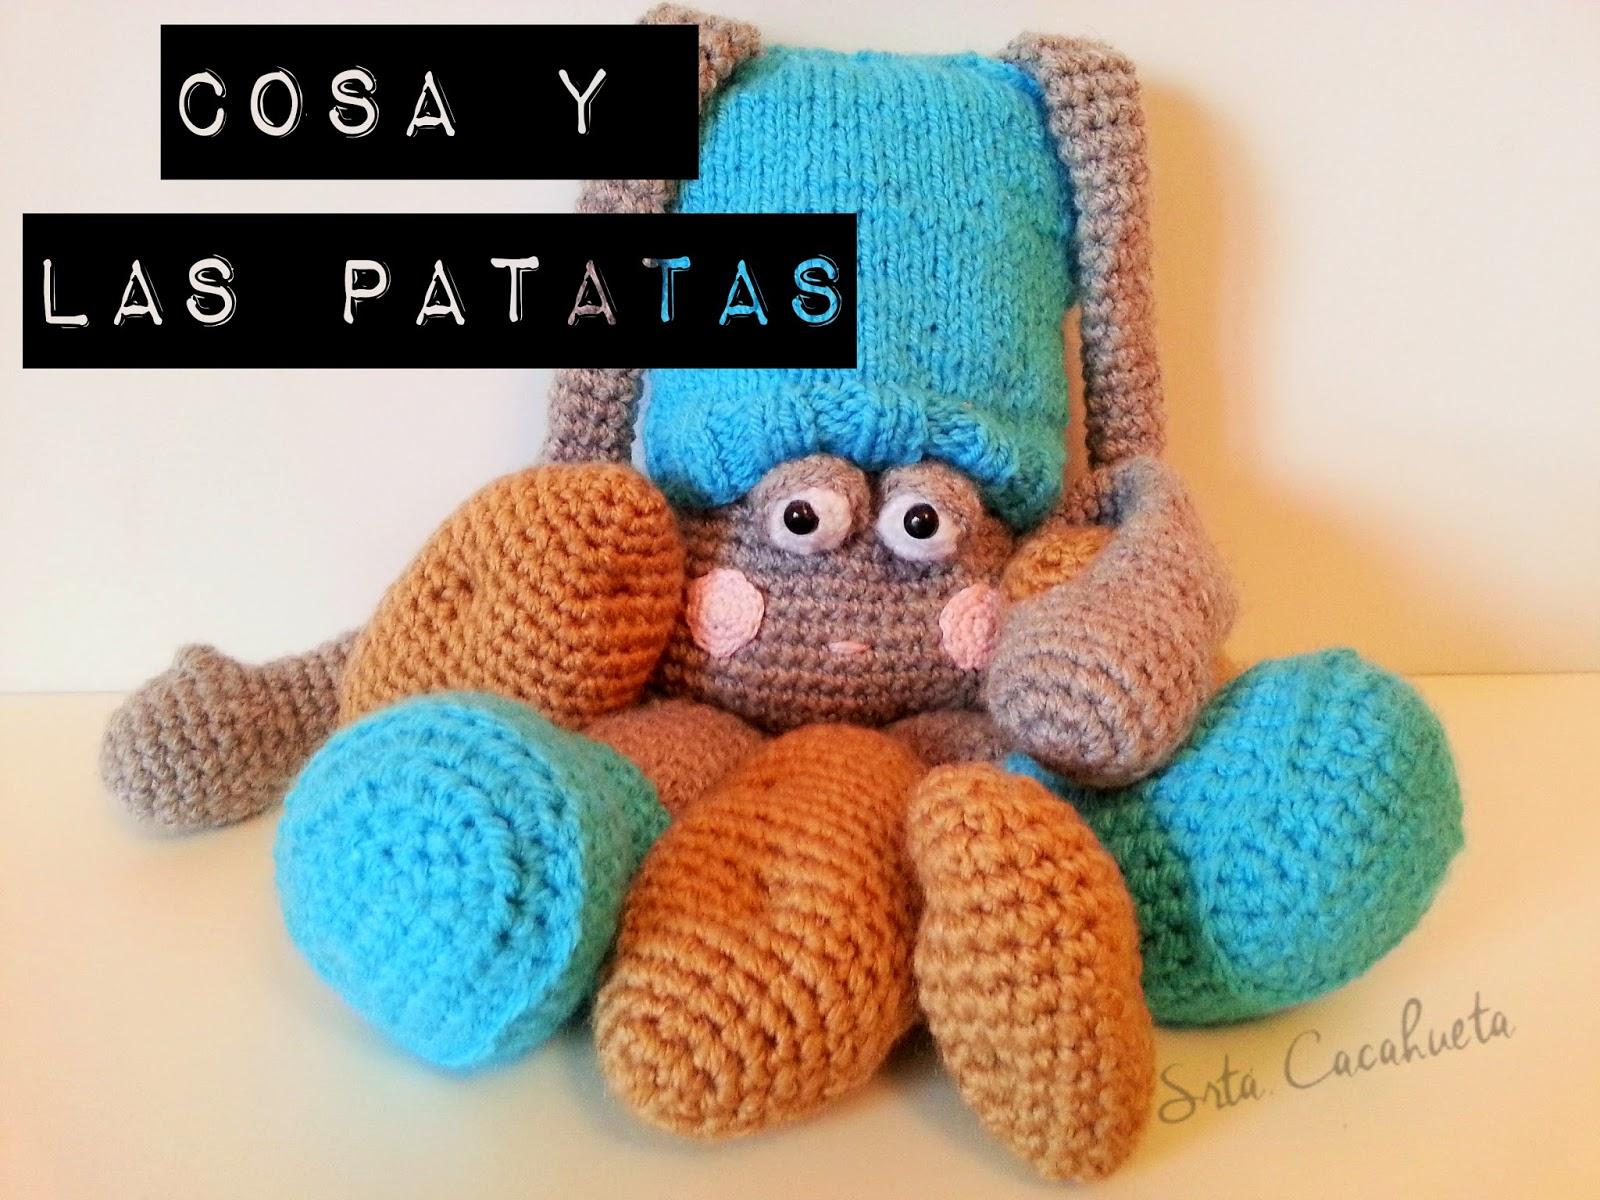 http://srtacacahueta.blogspot.com.es/2015/04/reto-iii-primeros-patrones-de-patatas.html